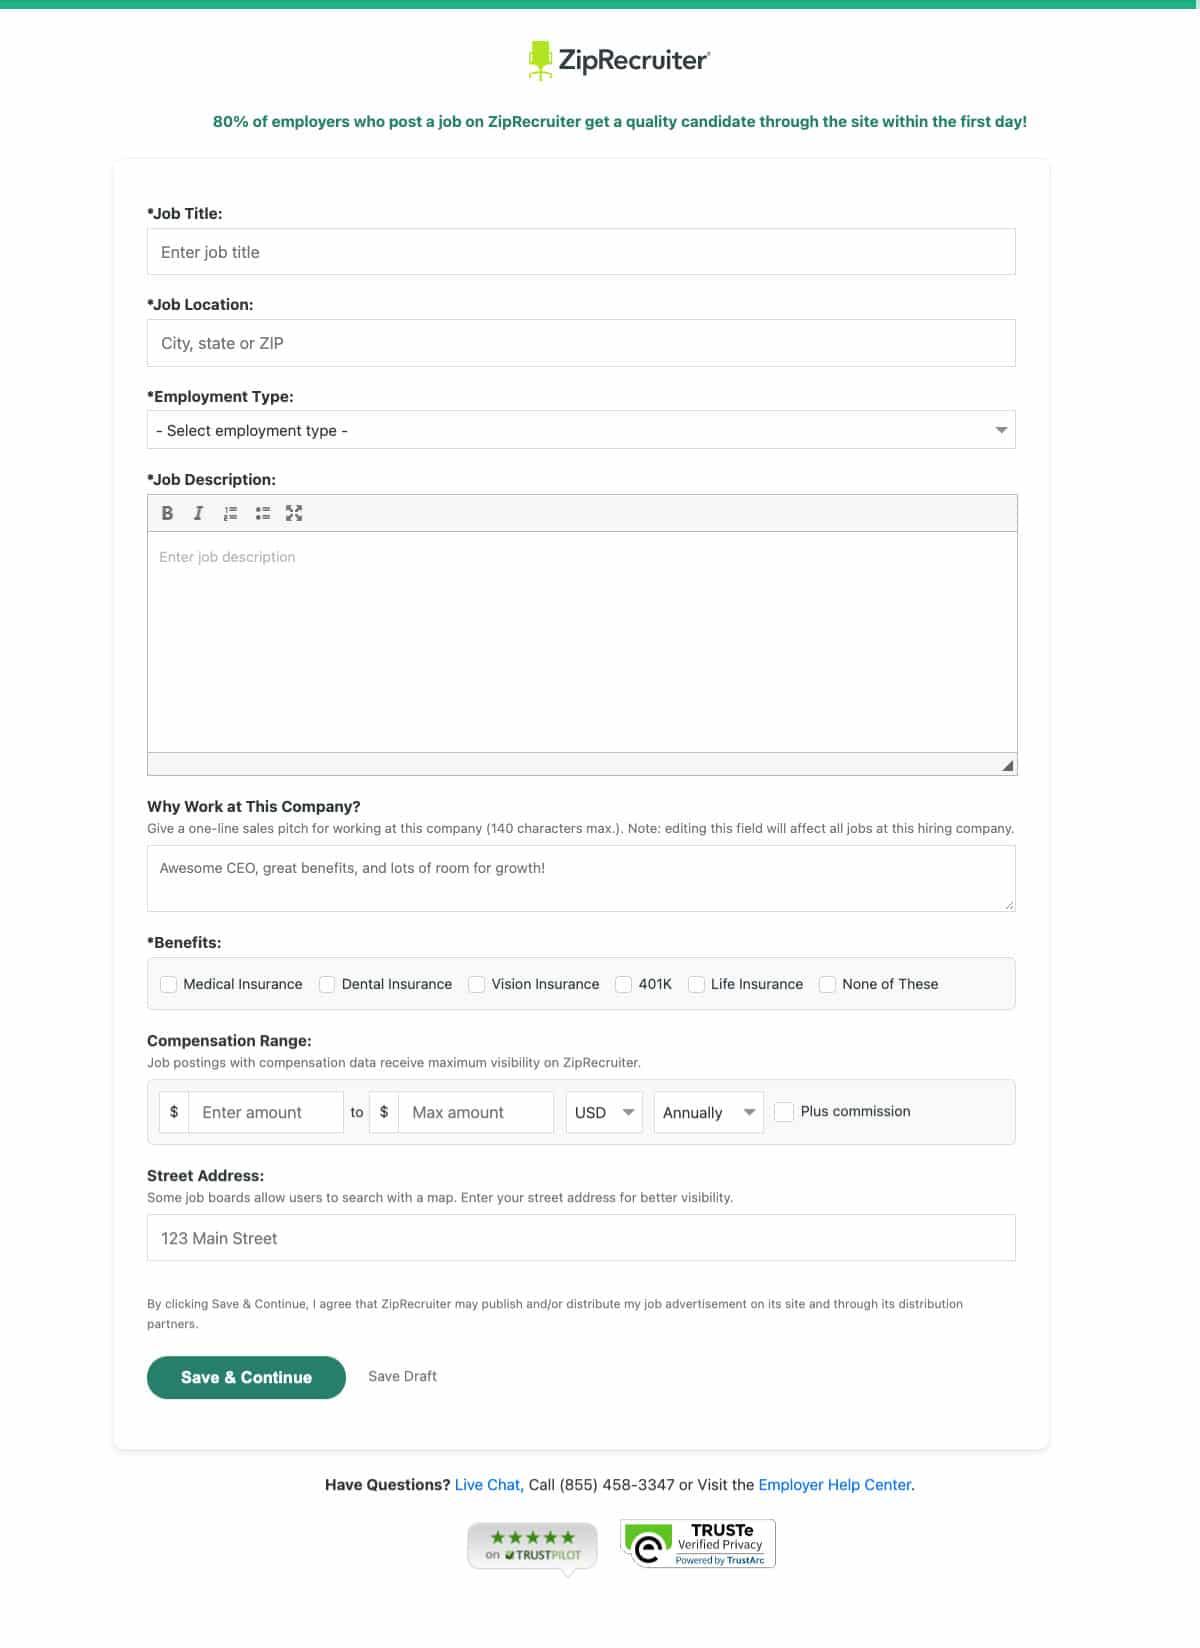 Posting Your Job on ZipRecruiter